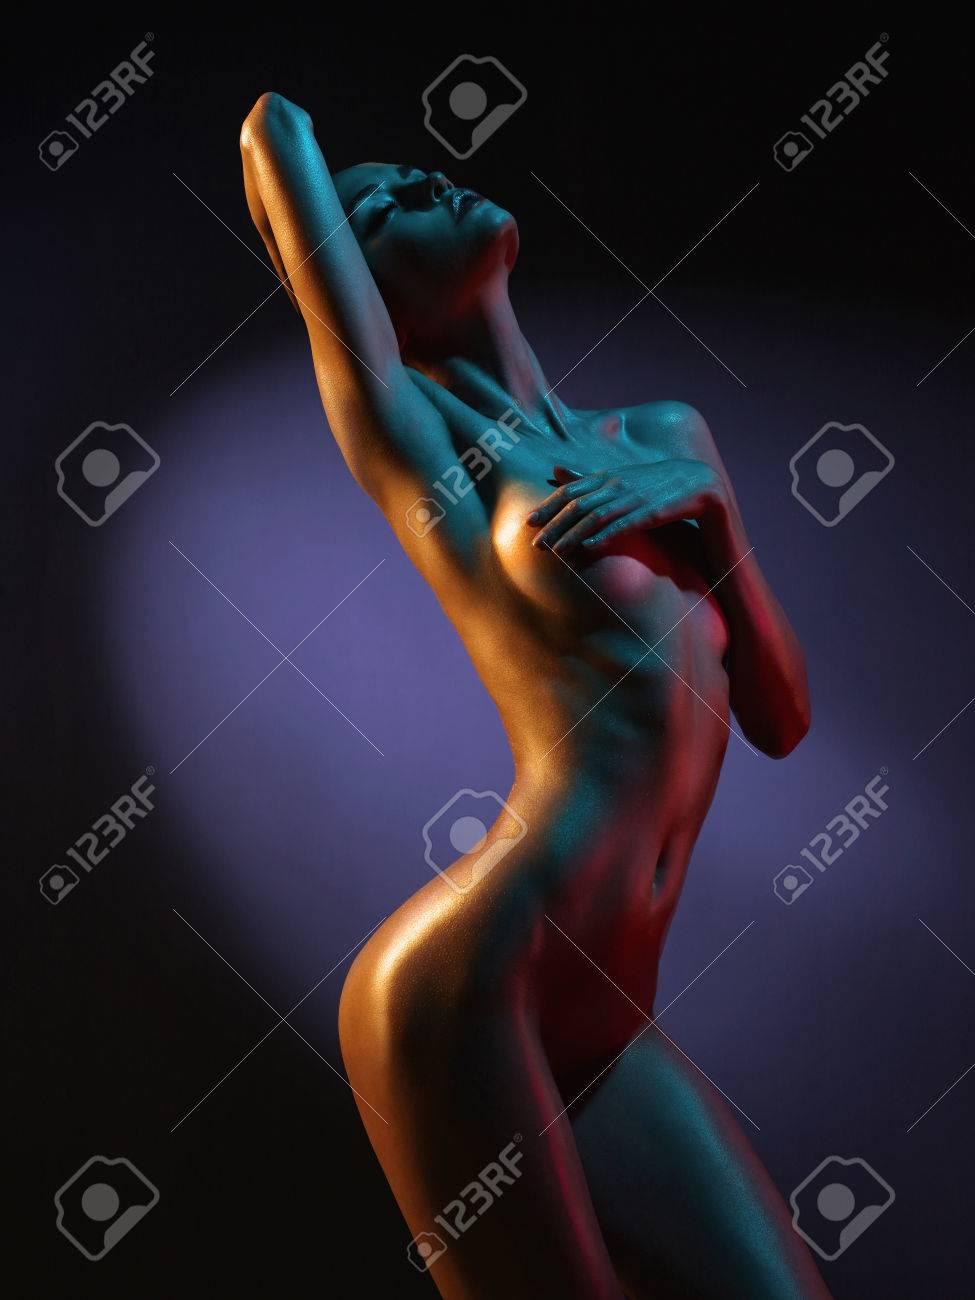 fashion art photo of elegant nude model in the light colored spotlights Standard-Bild - 52039951